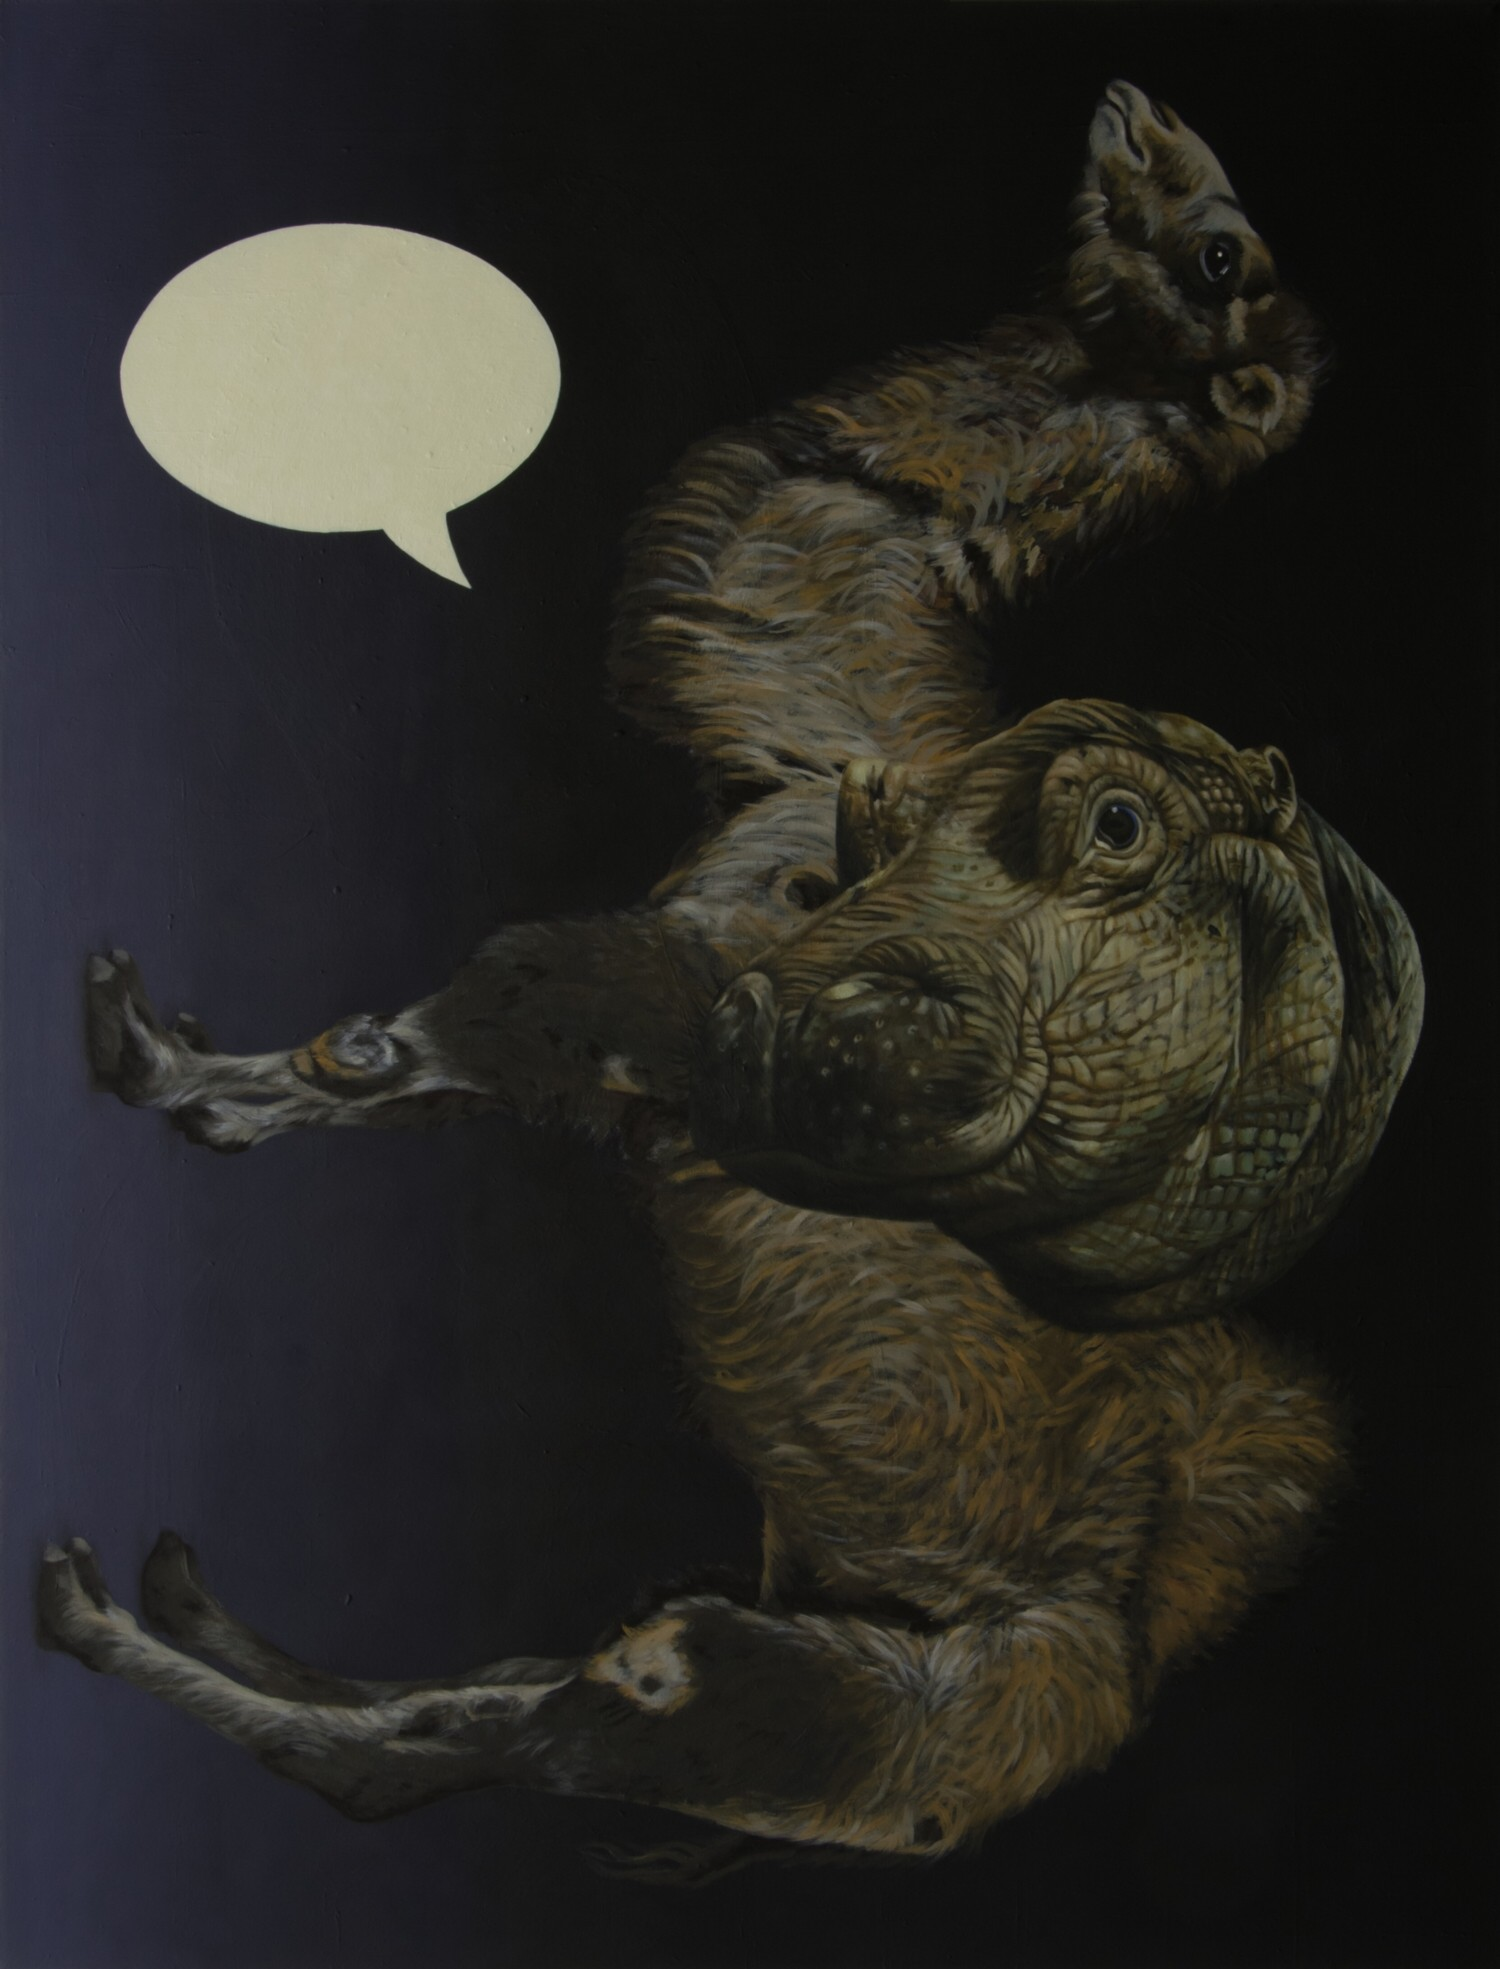 sic  2015, 130 × 100 cm, Öl auf Nessel